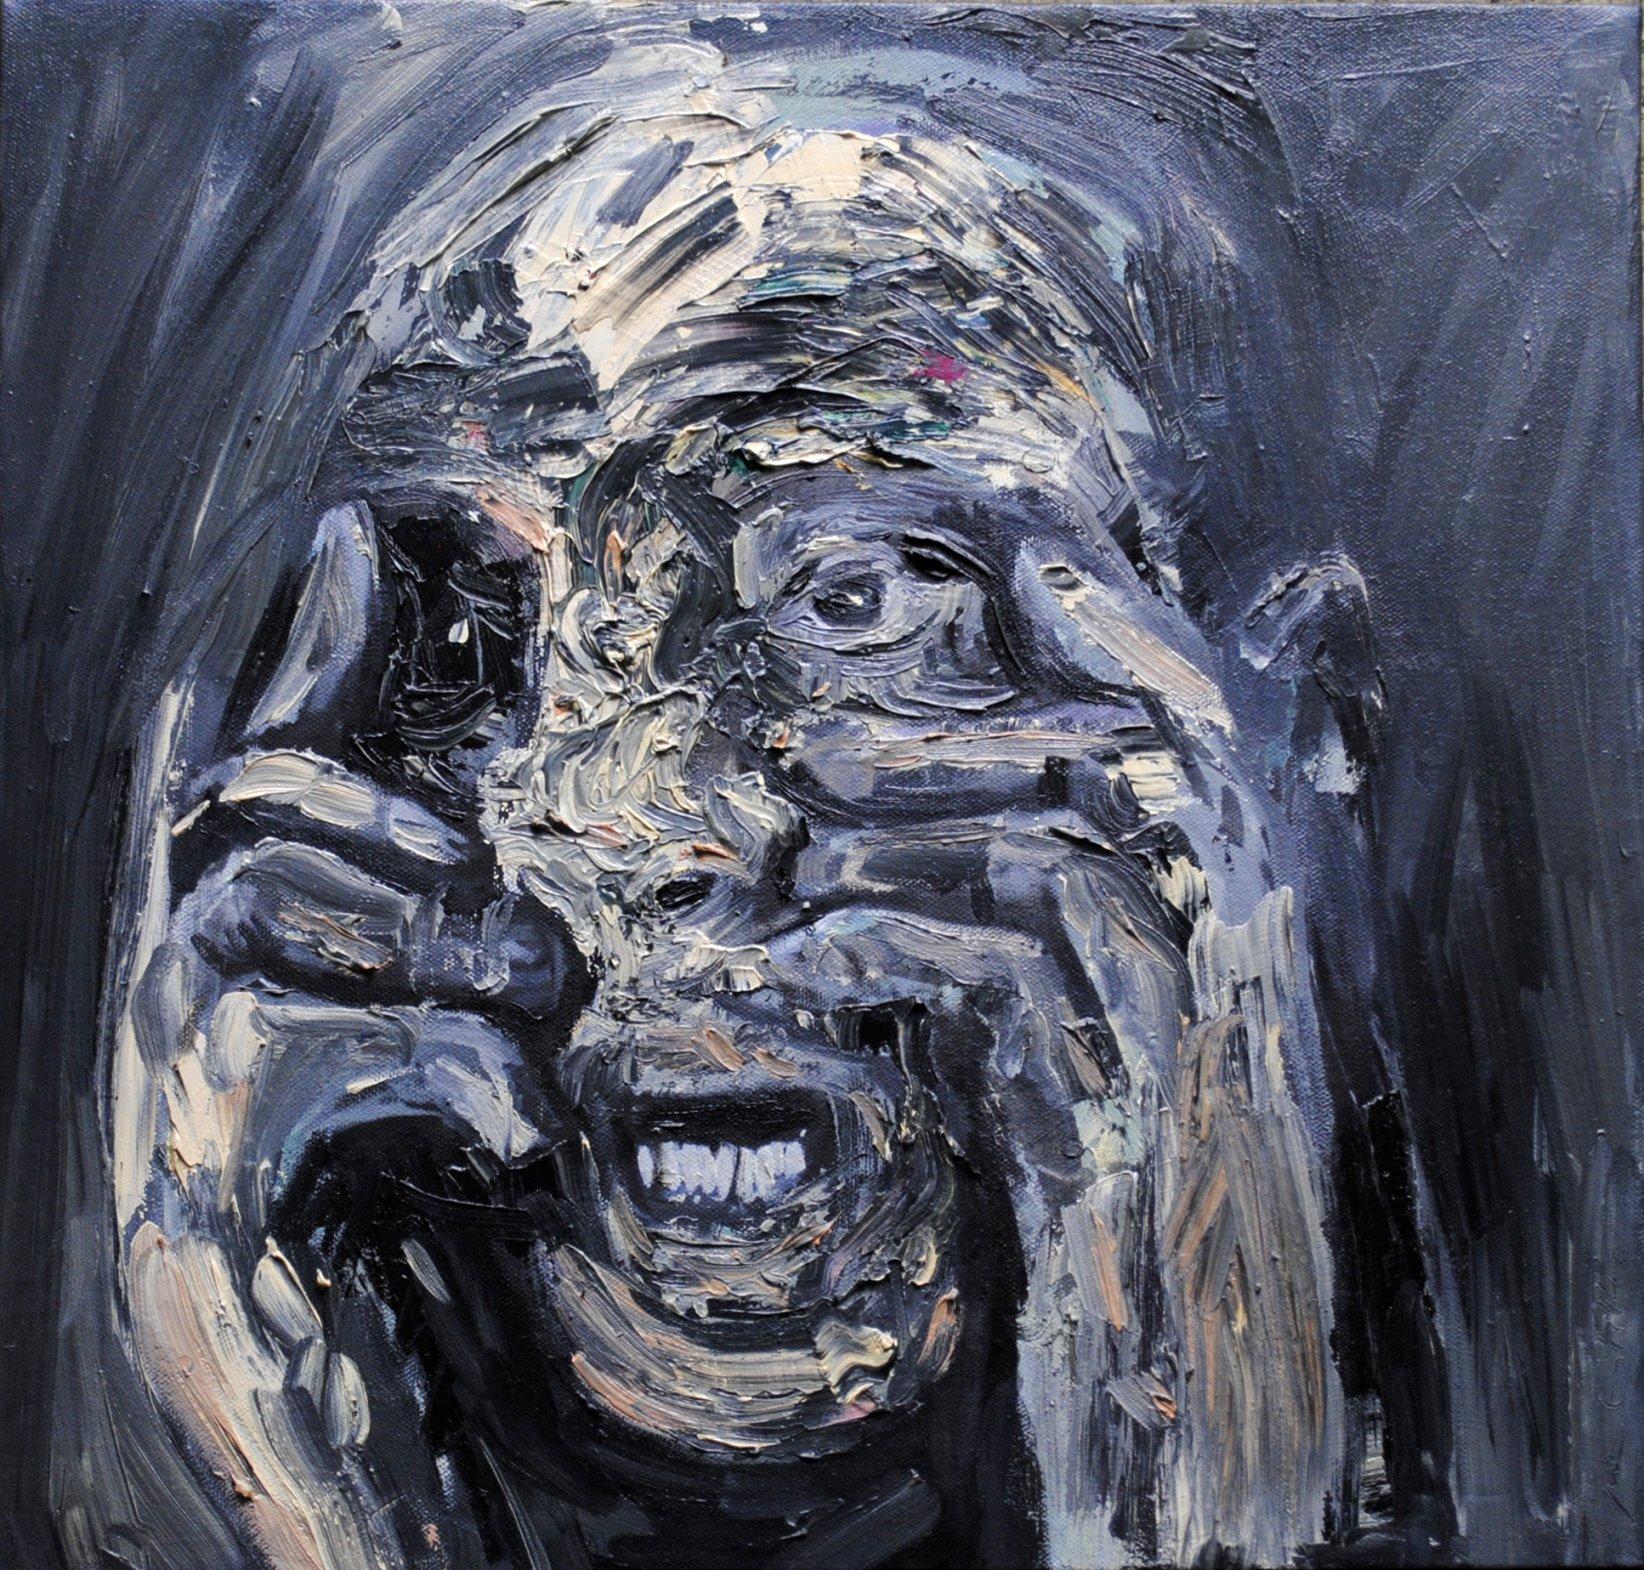 Sin titulo (2015) - Jose Castillo Picado